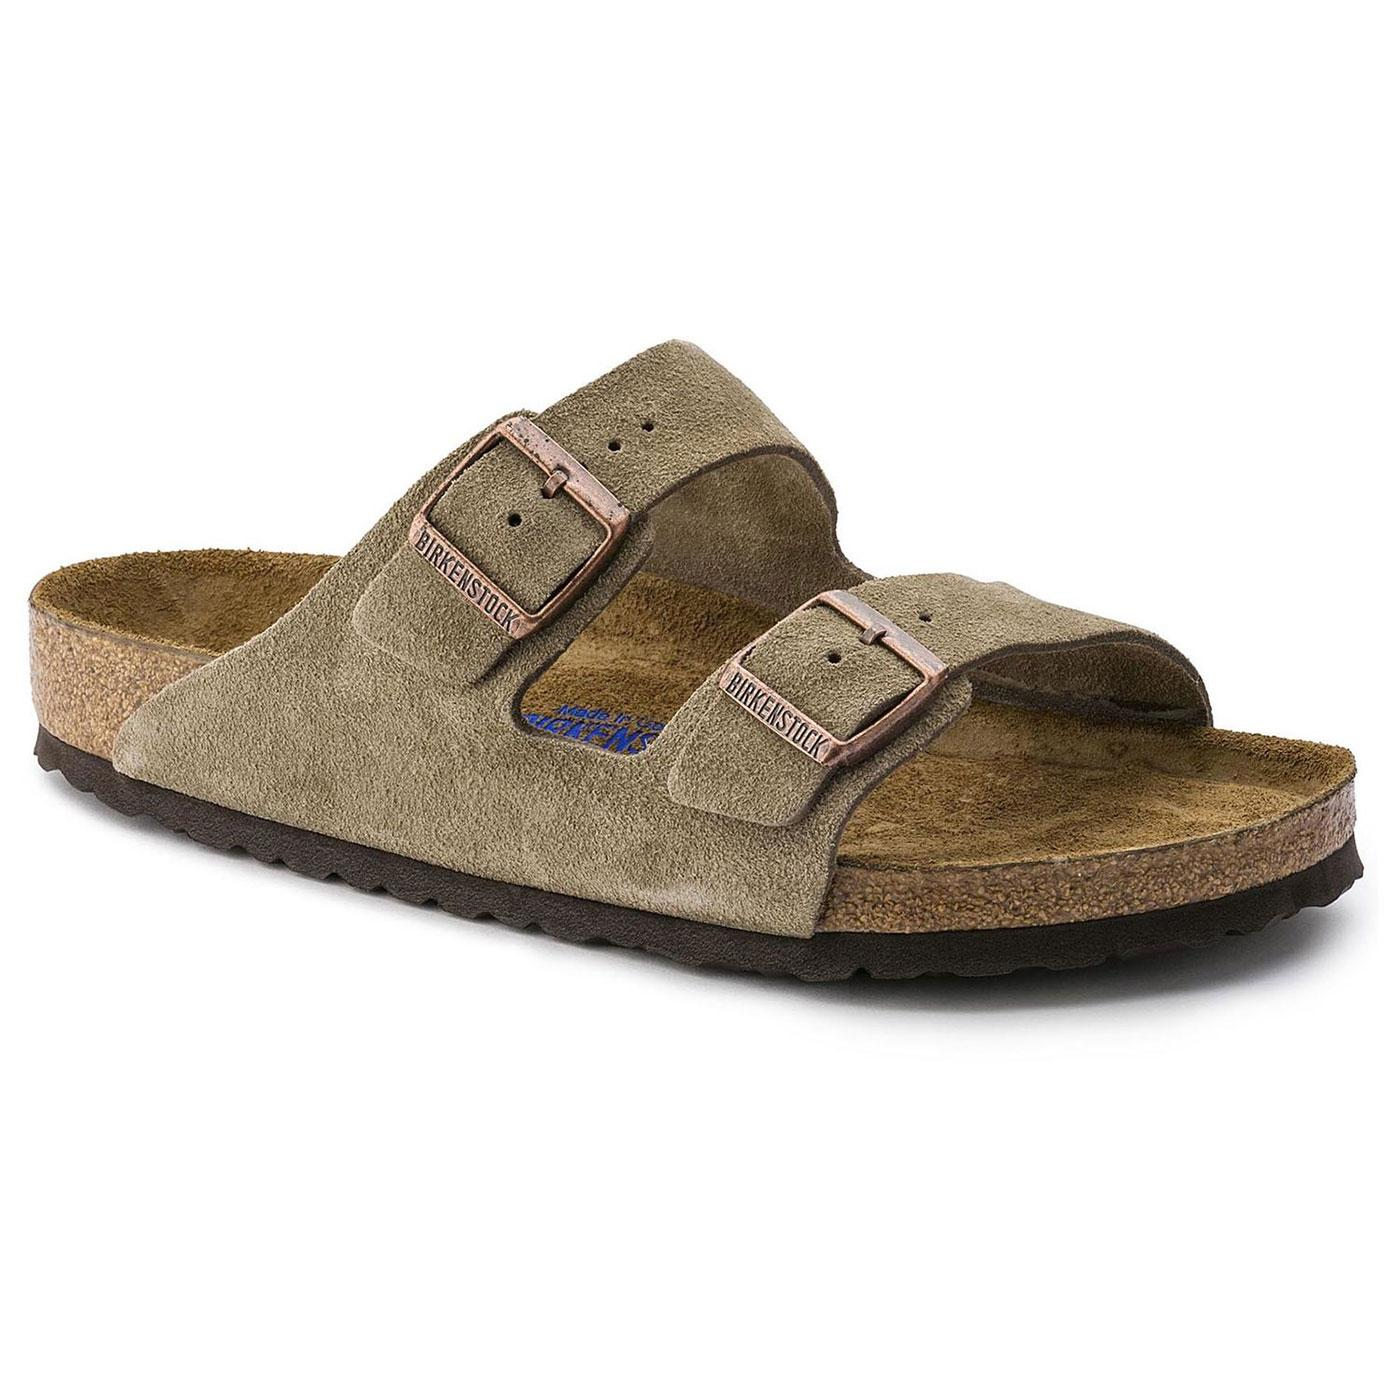 Arizona Soft Footbed BIRKENSTOCK Retro Sandals T